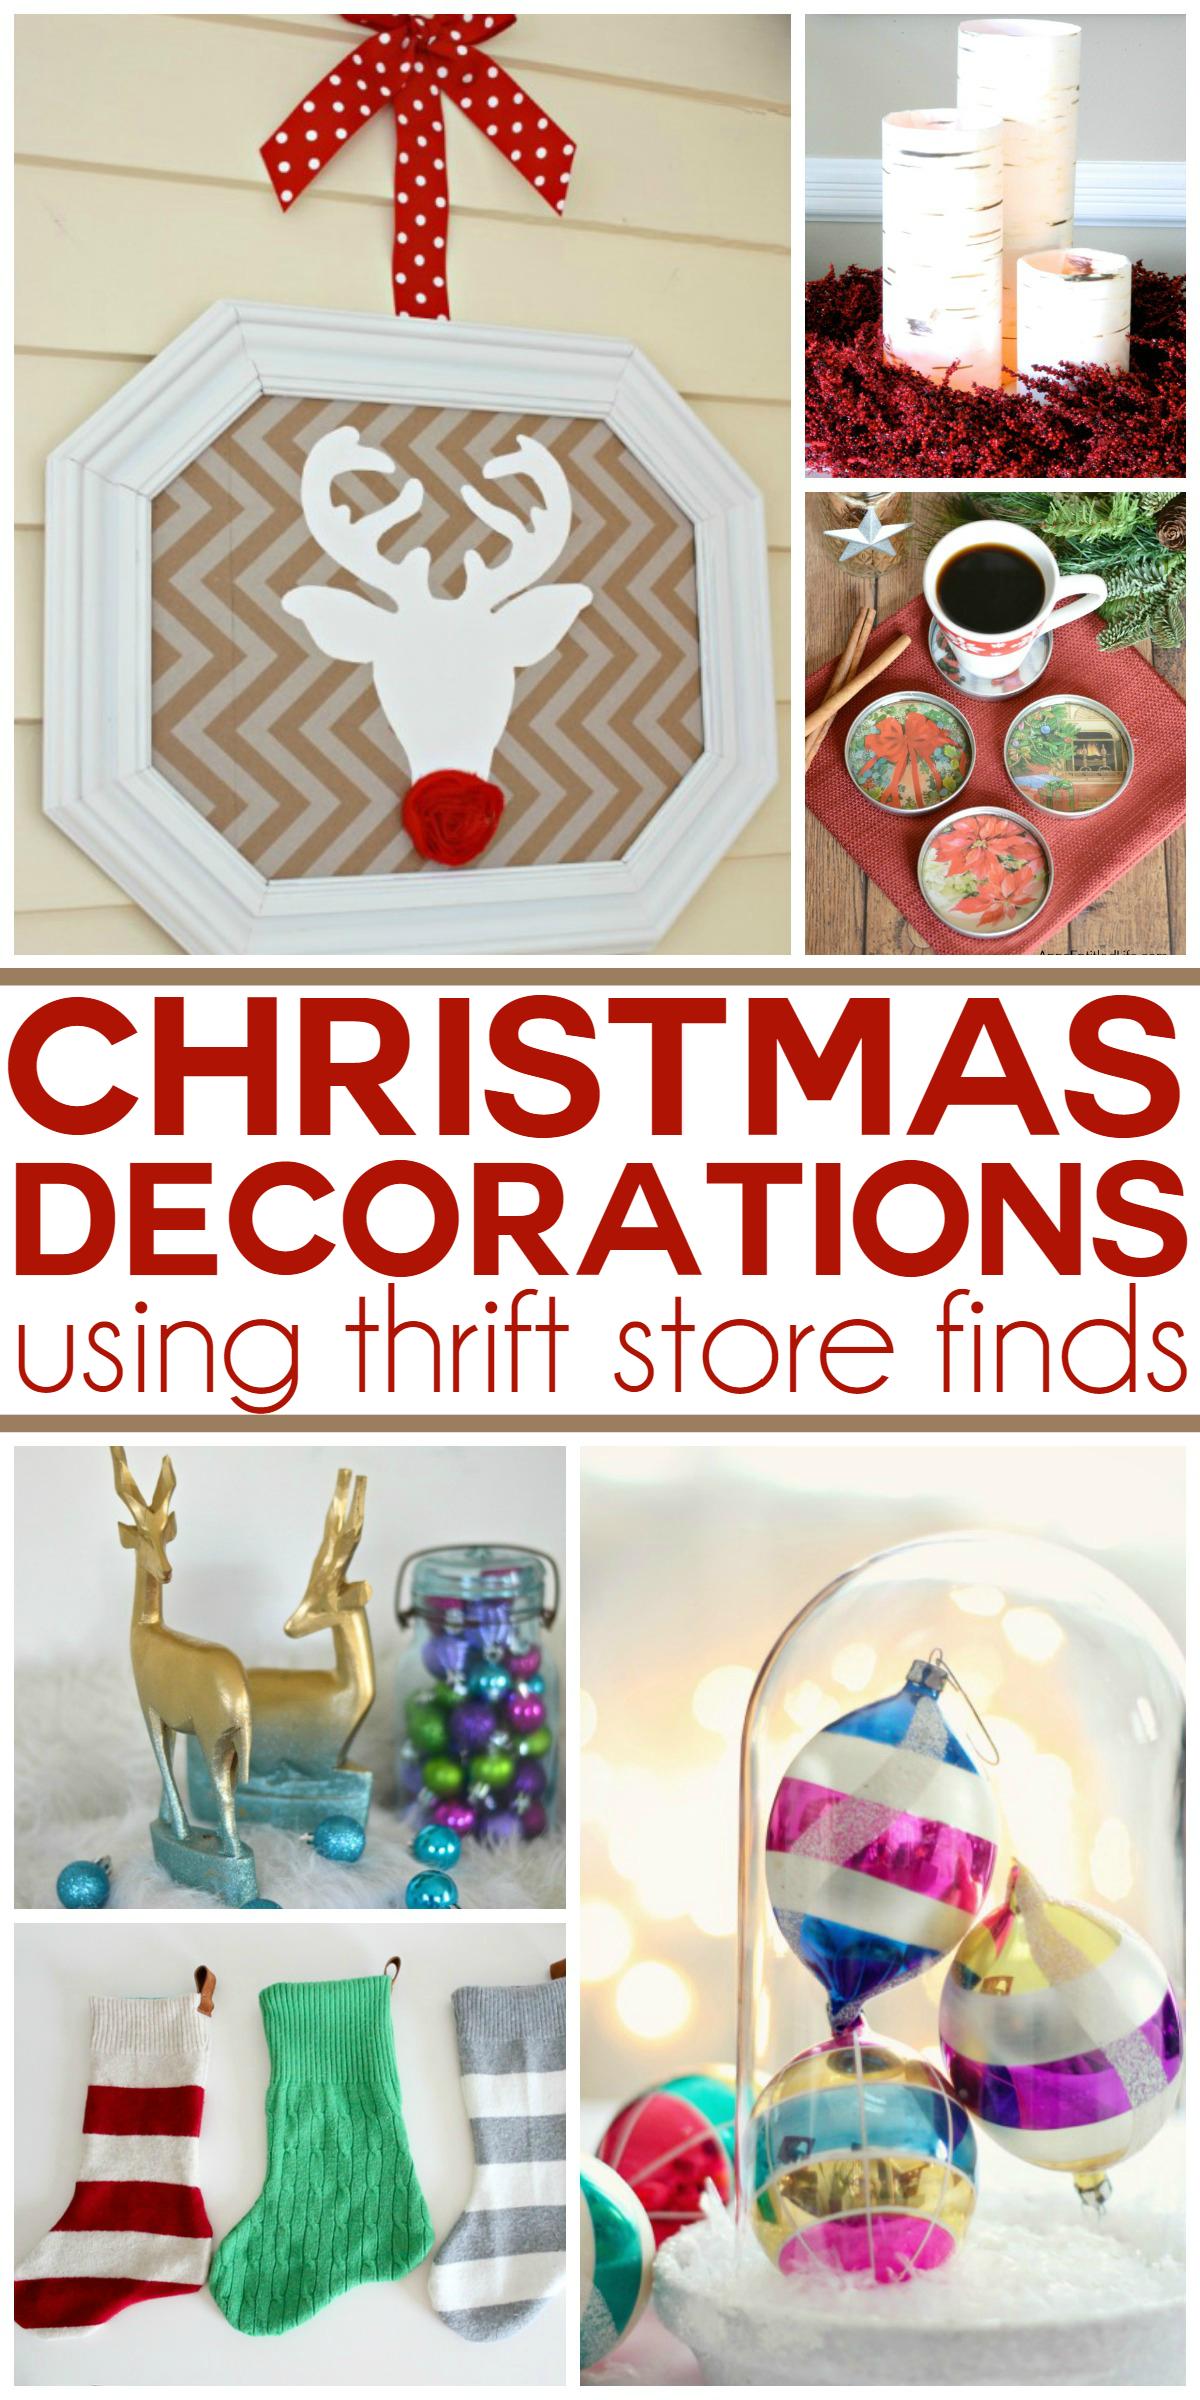 25 Thrift Store Christmas Decor Ideas | Making Lemonade